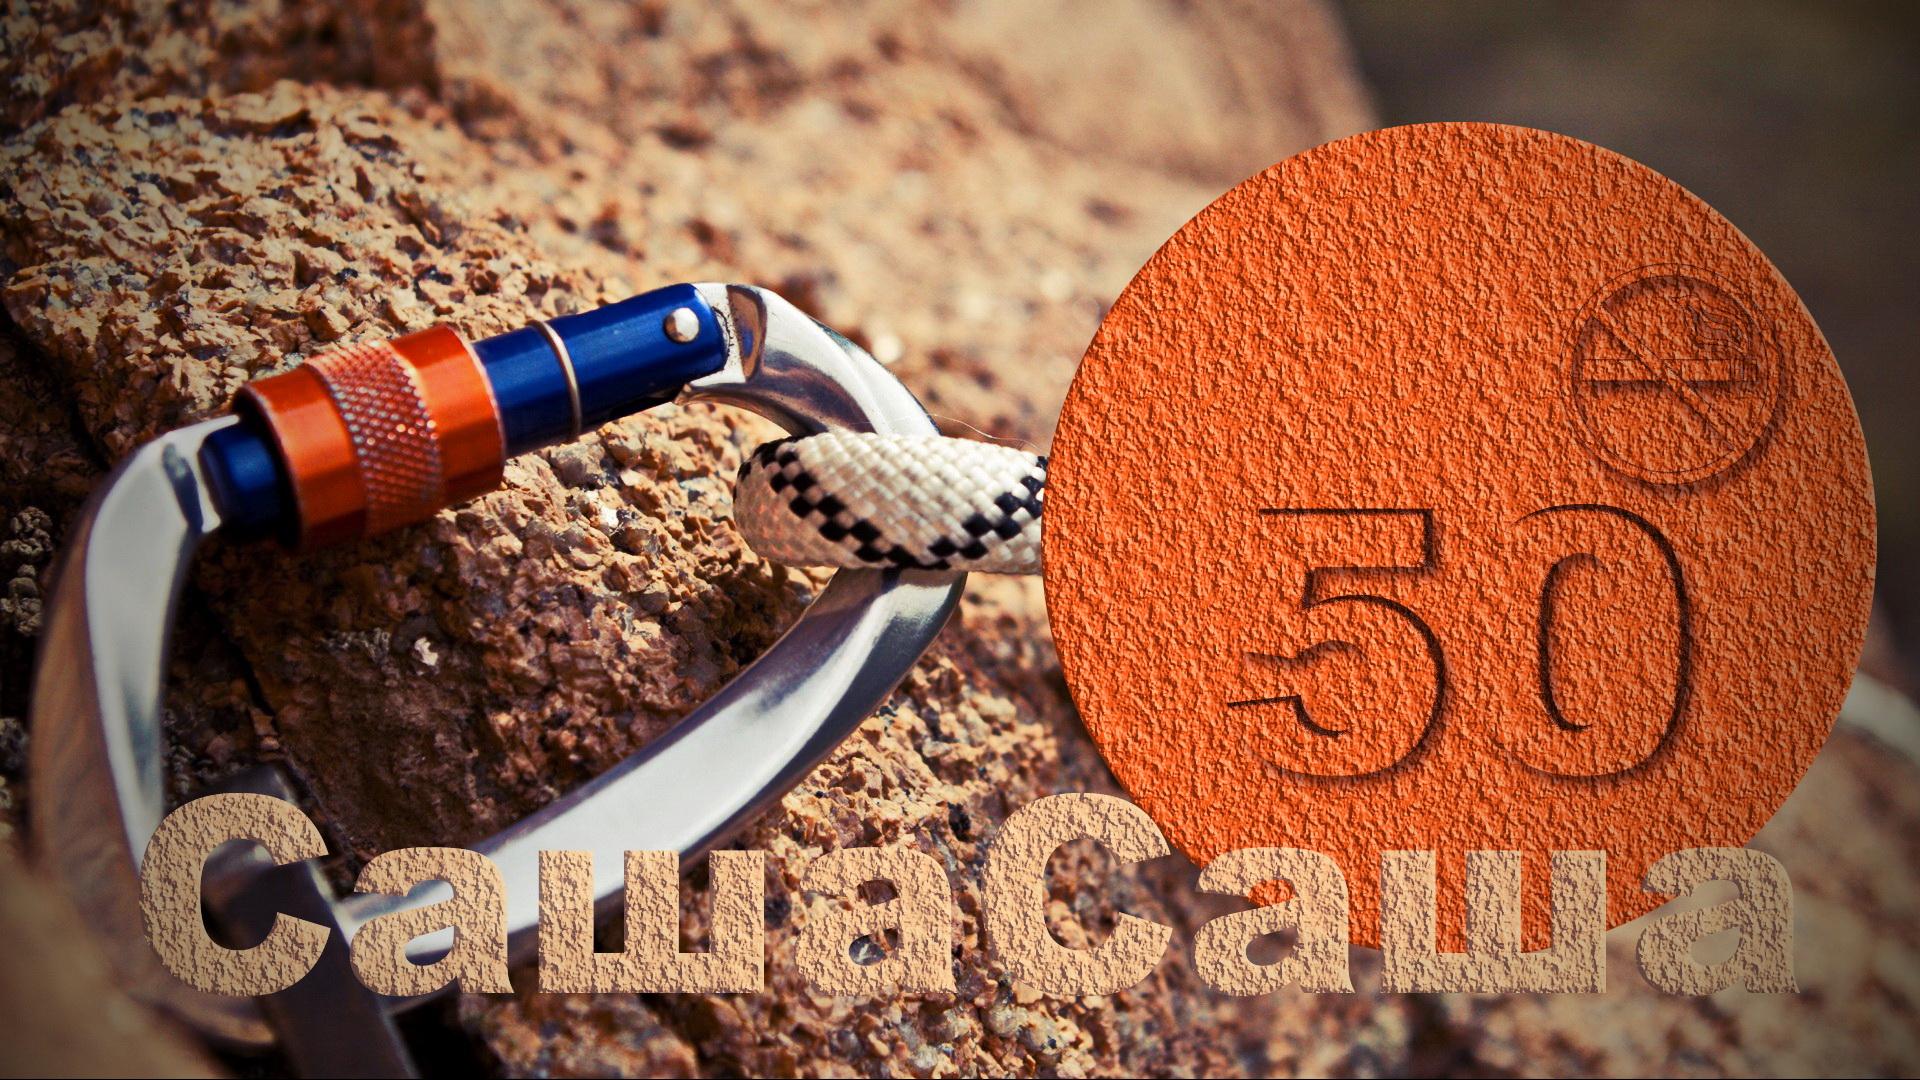 sclimbing_rope_rock-jpg.237711